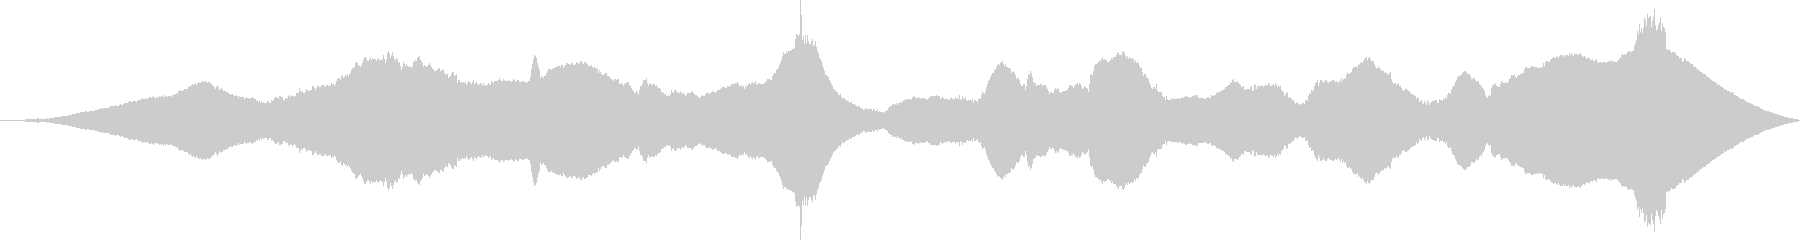 ASMR 電動マッサージ機を使うの未再生の波形